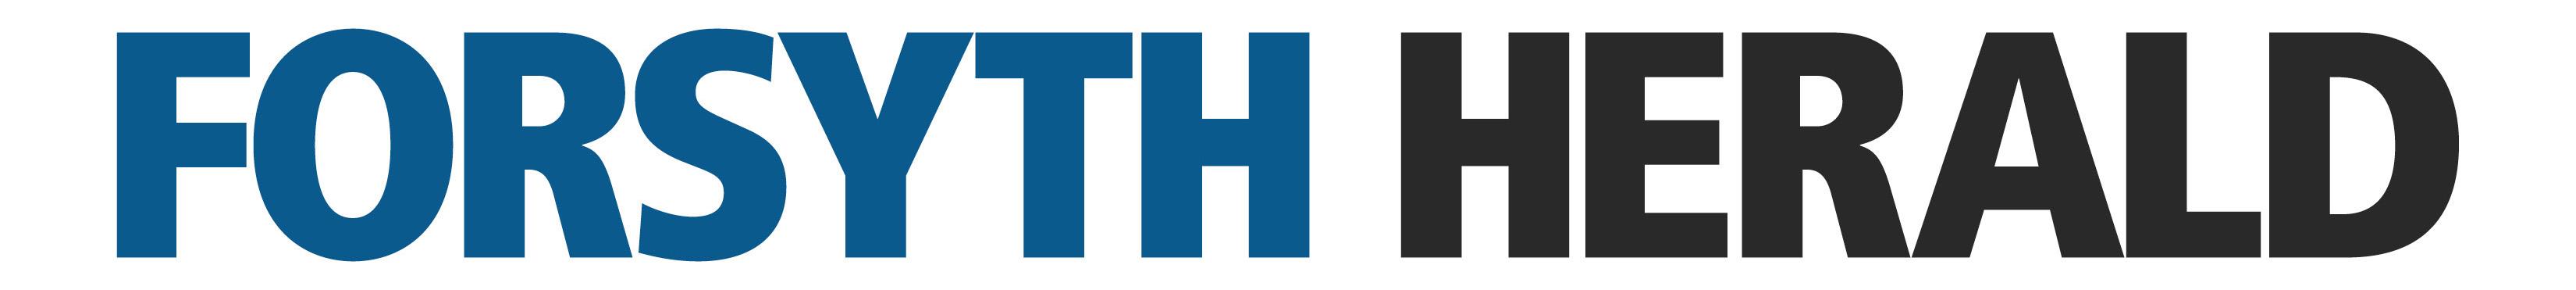 Forsyth Herald Logo